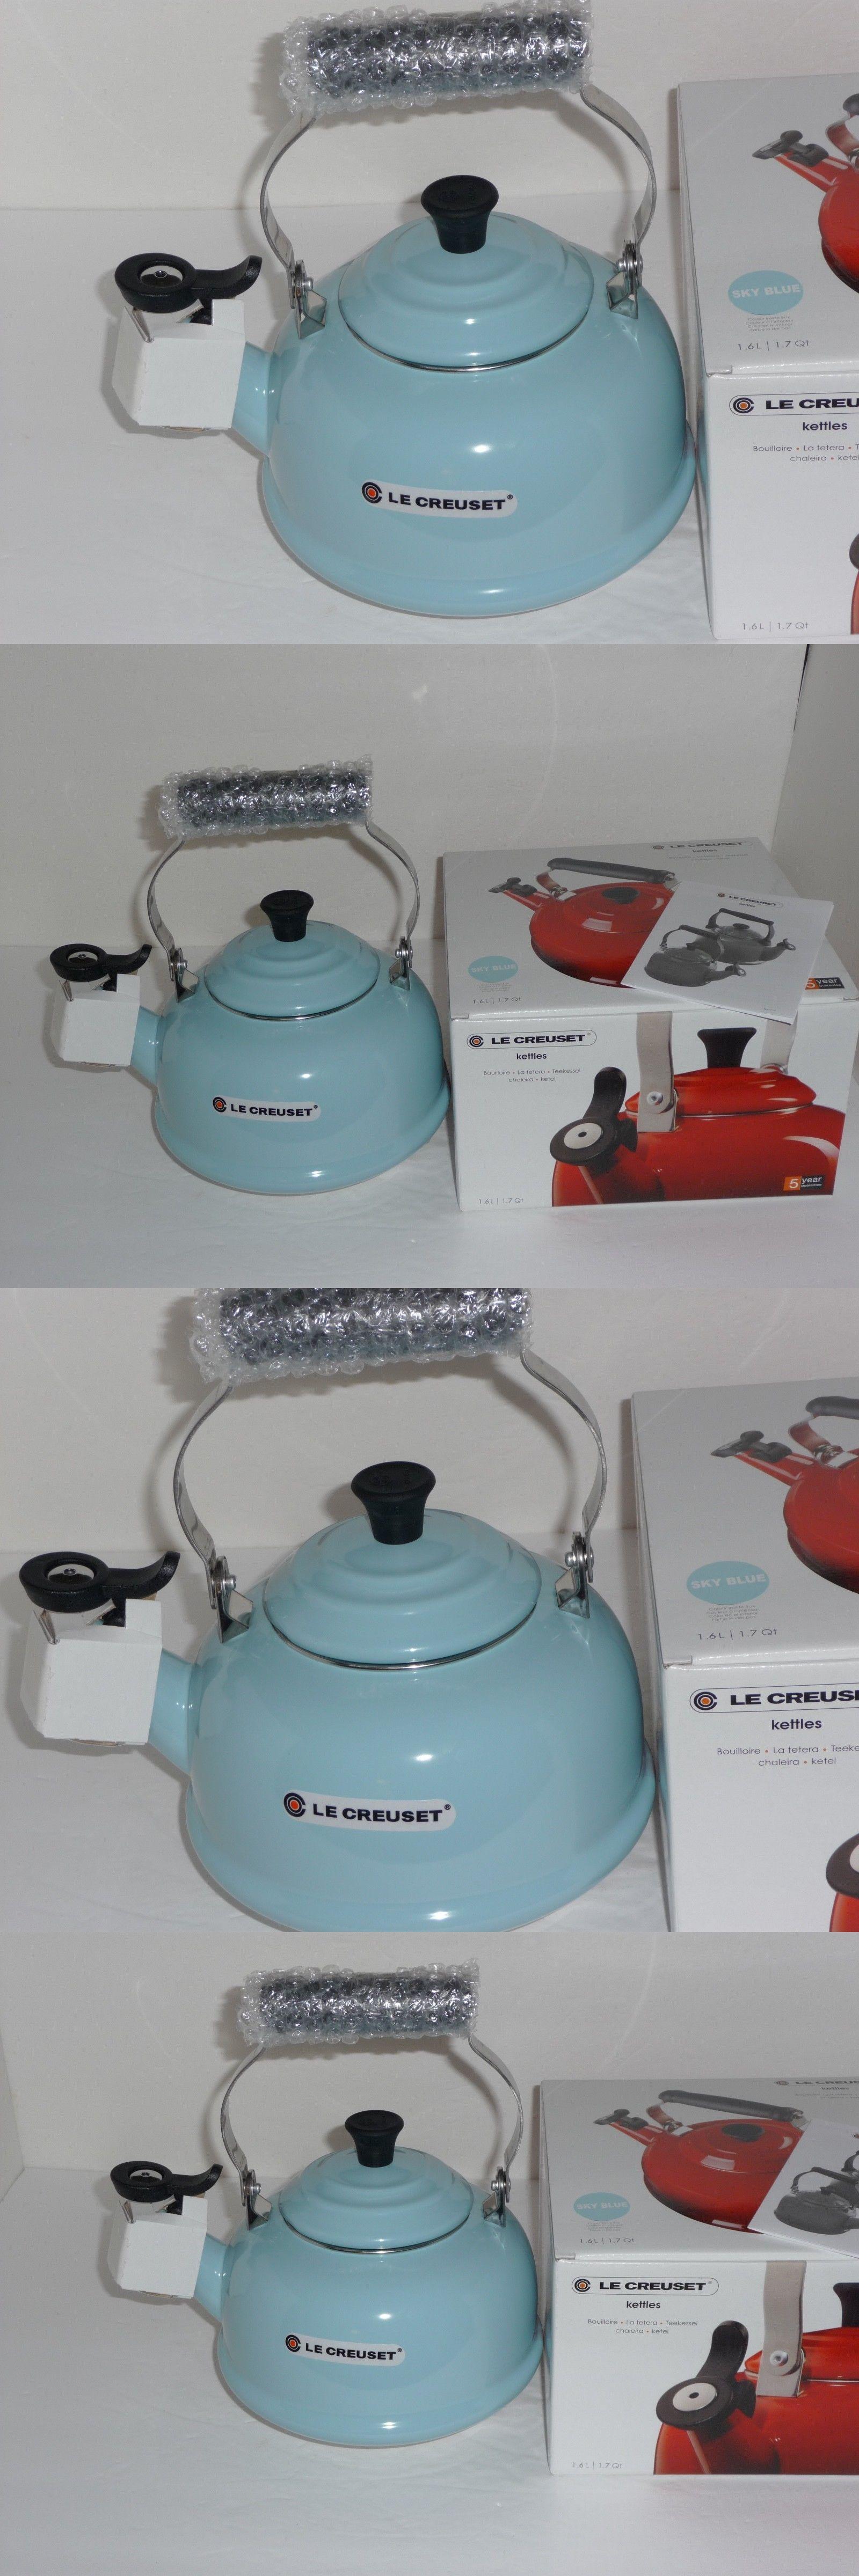 Le Creuset 1 7 Qt Tea Kettle Teakettle Whistling Light Blue New In Box Tea Kettle Creuset Kettle